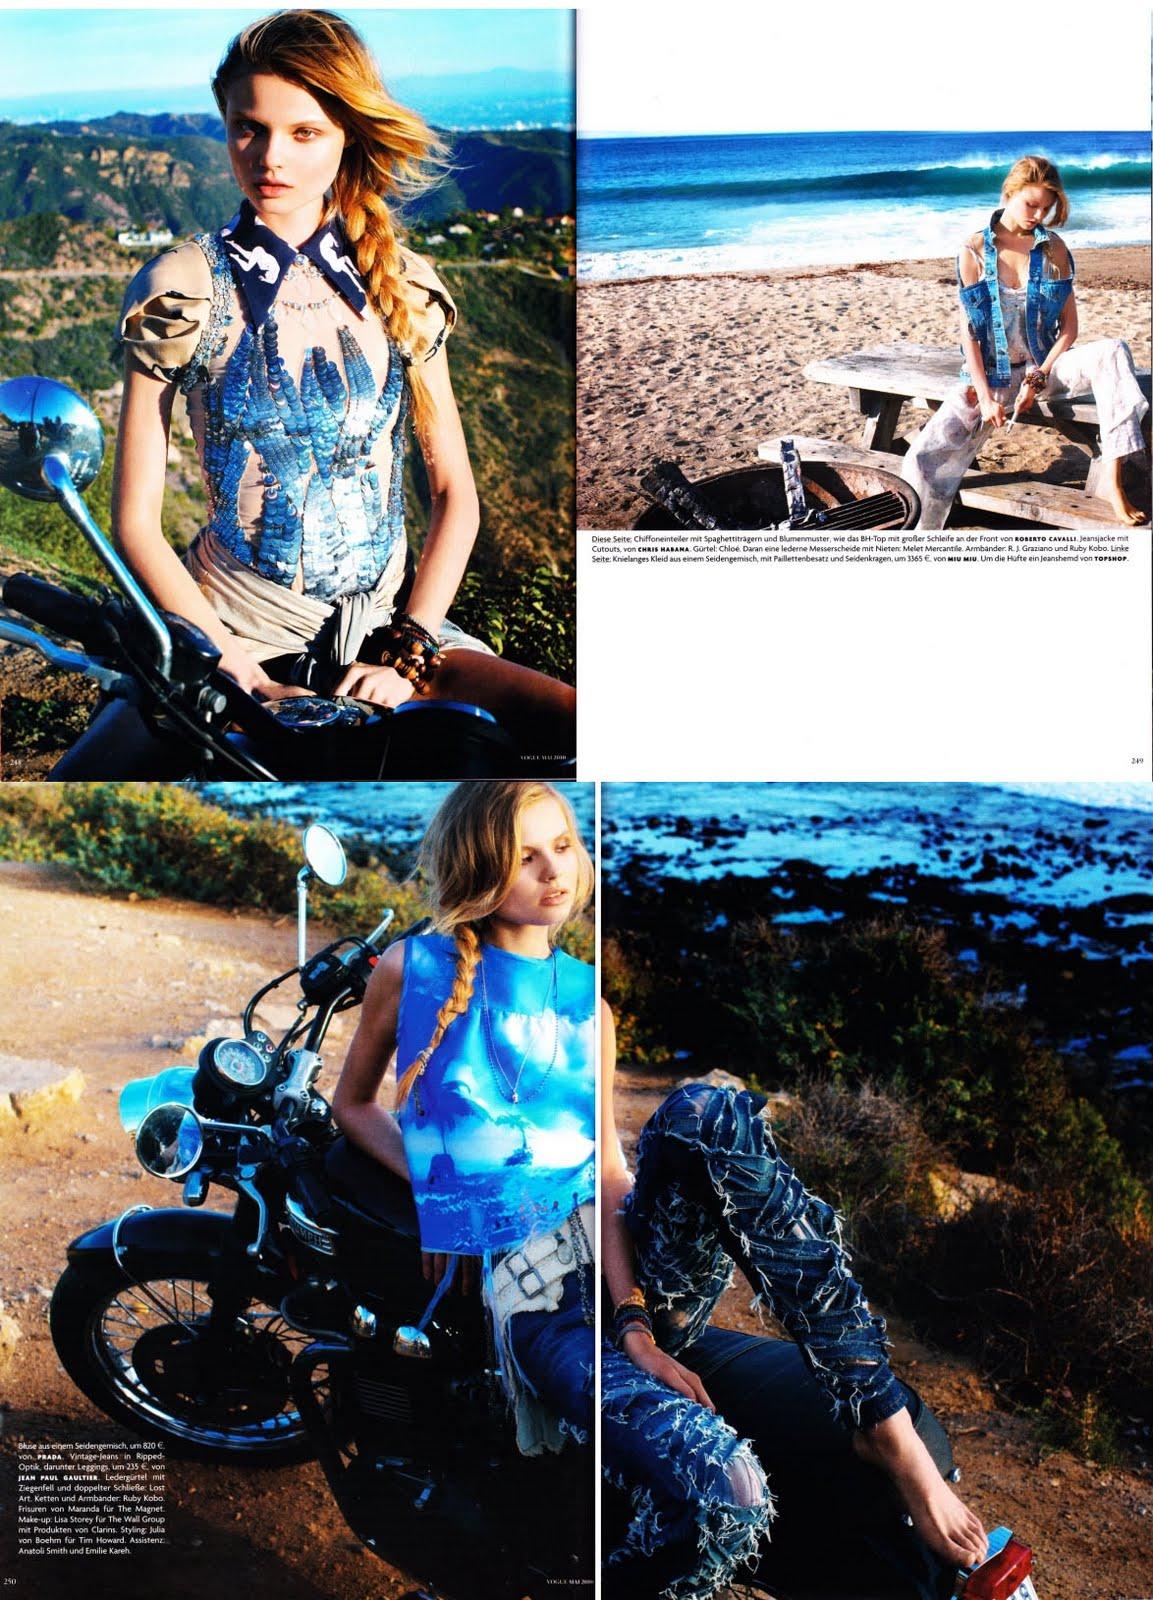 http://3.bp.blogspot.com/_twYmnhXVfP4/S9Lx91MH5AI/AAAAAAAAJg4/LGwyFsOGKIU/s1600/editorial6.jpg